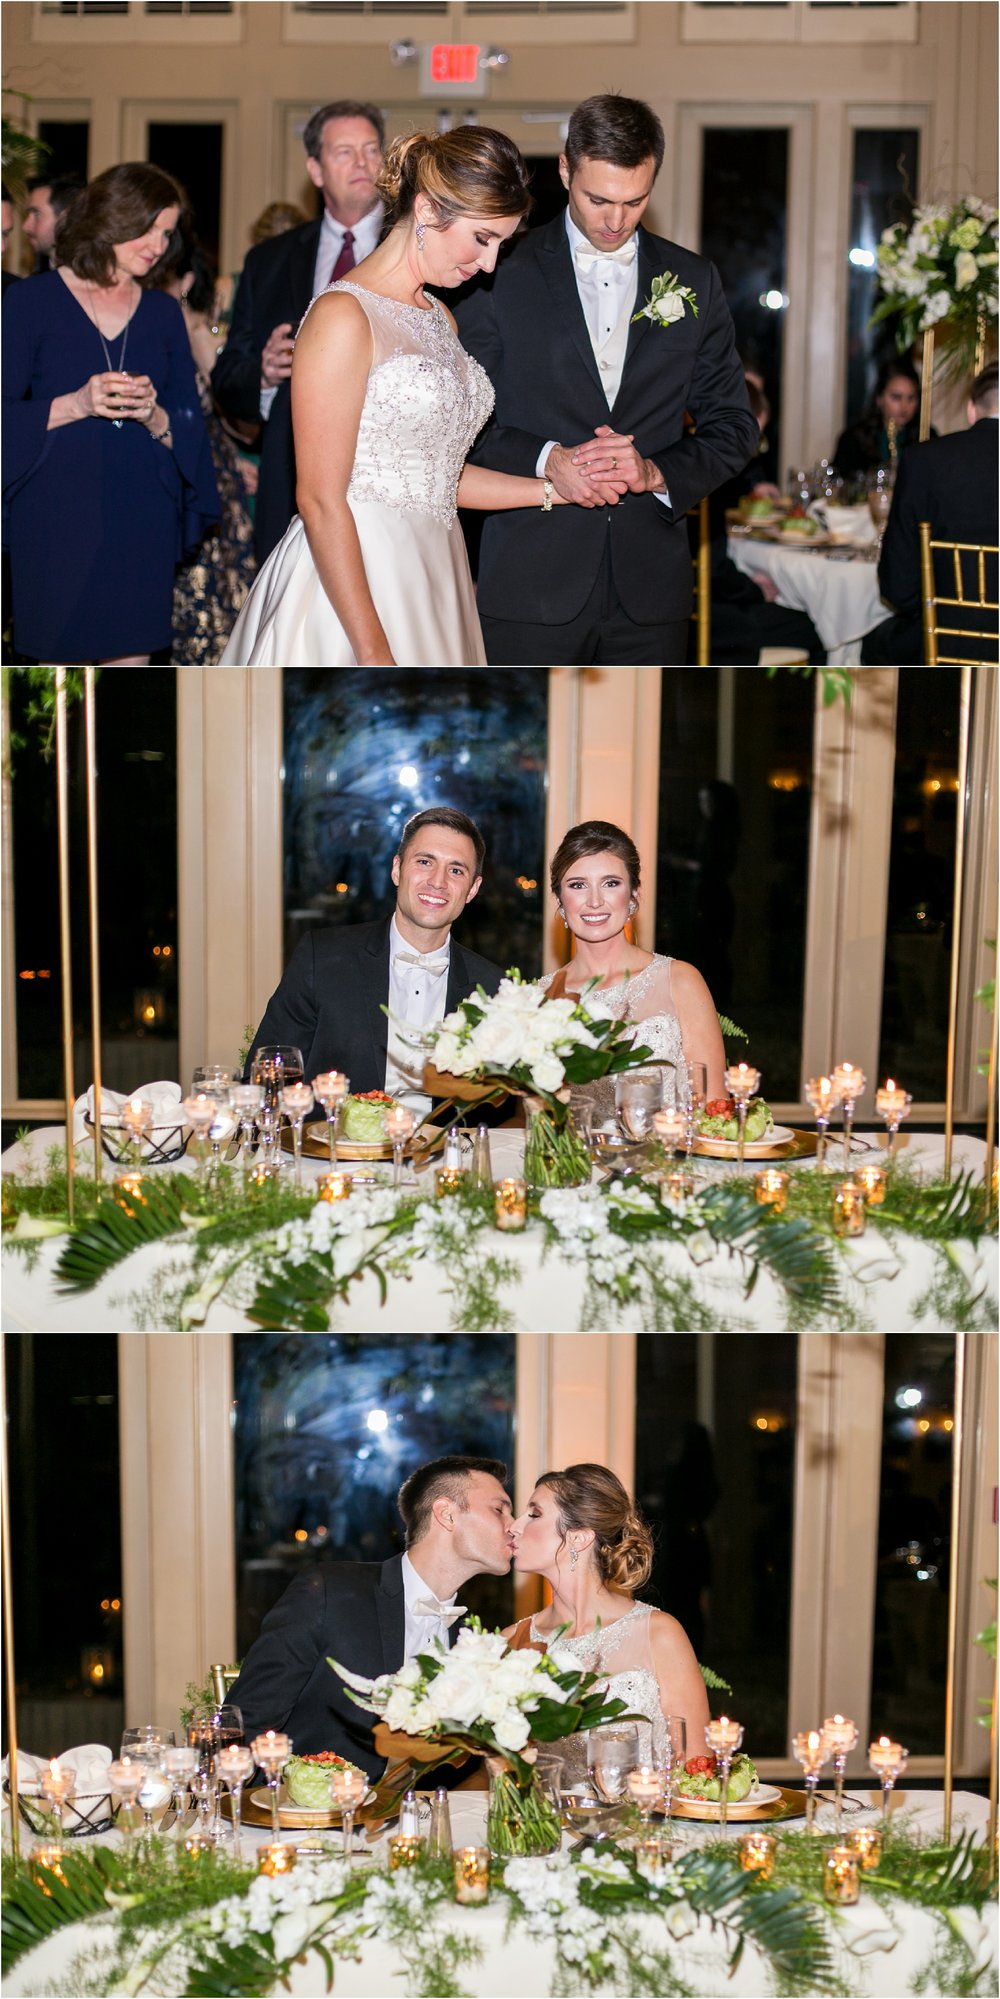 Savannah Eve Photography- Bottiglion-Scope Wedding- Sneak Peek-87.jpg